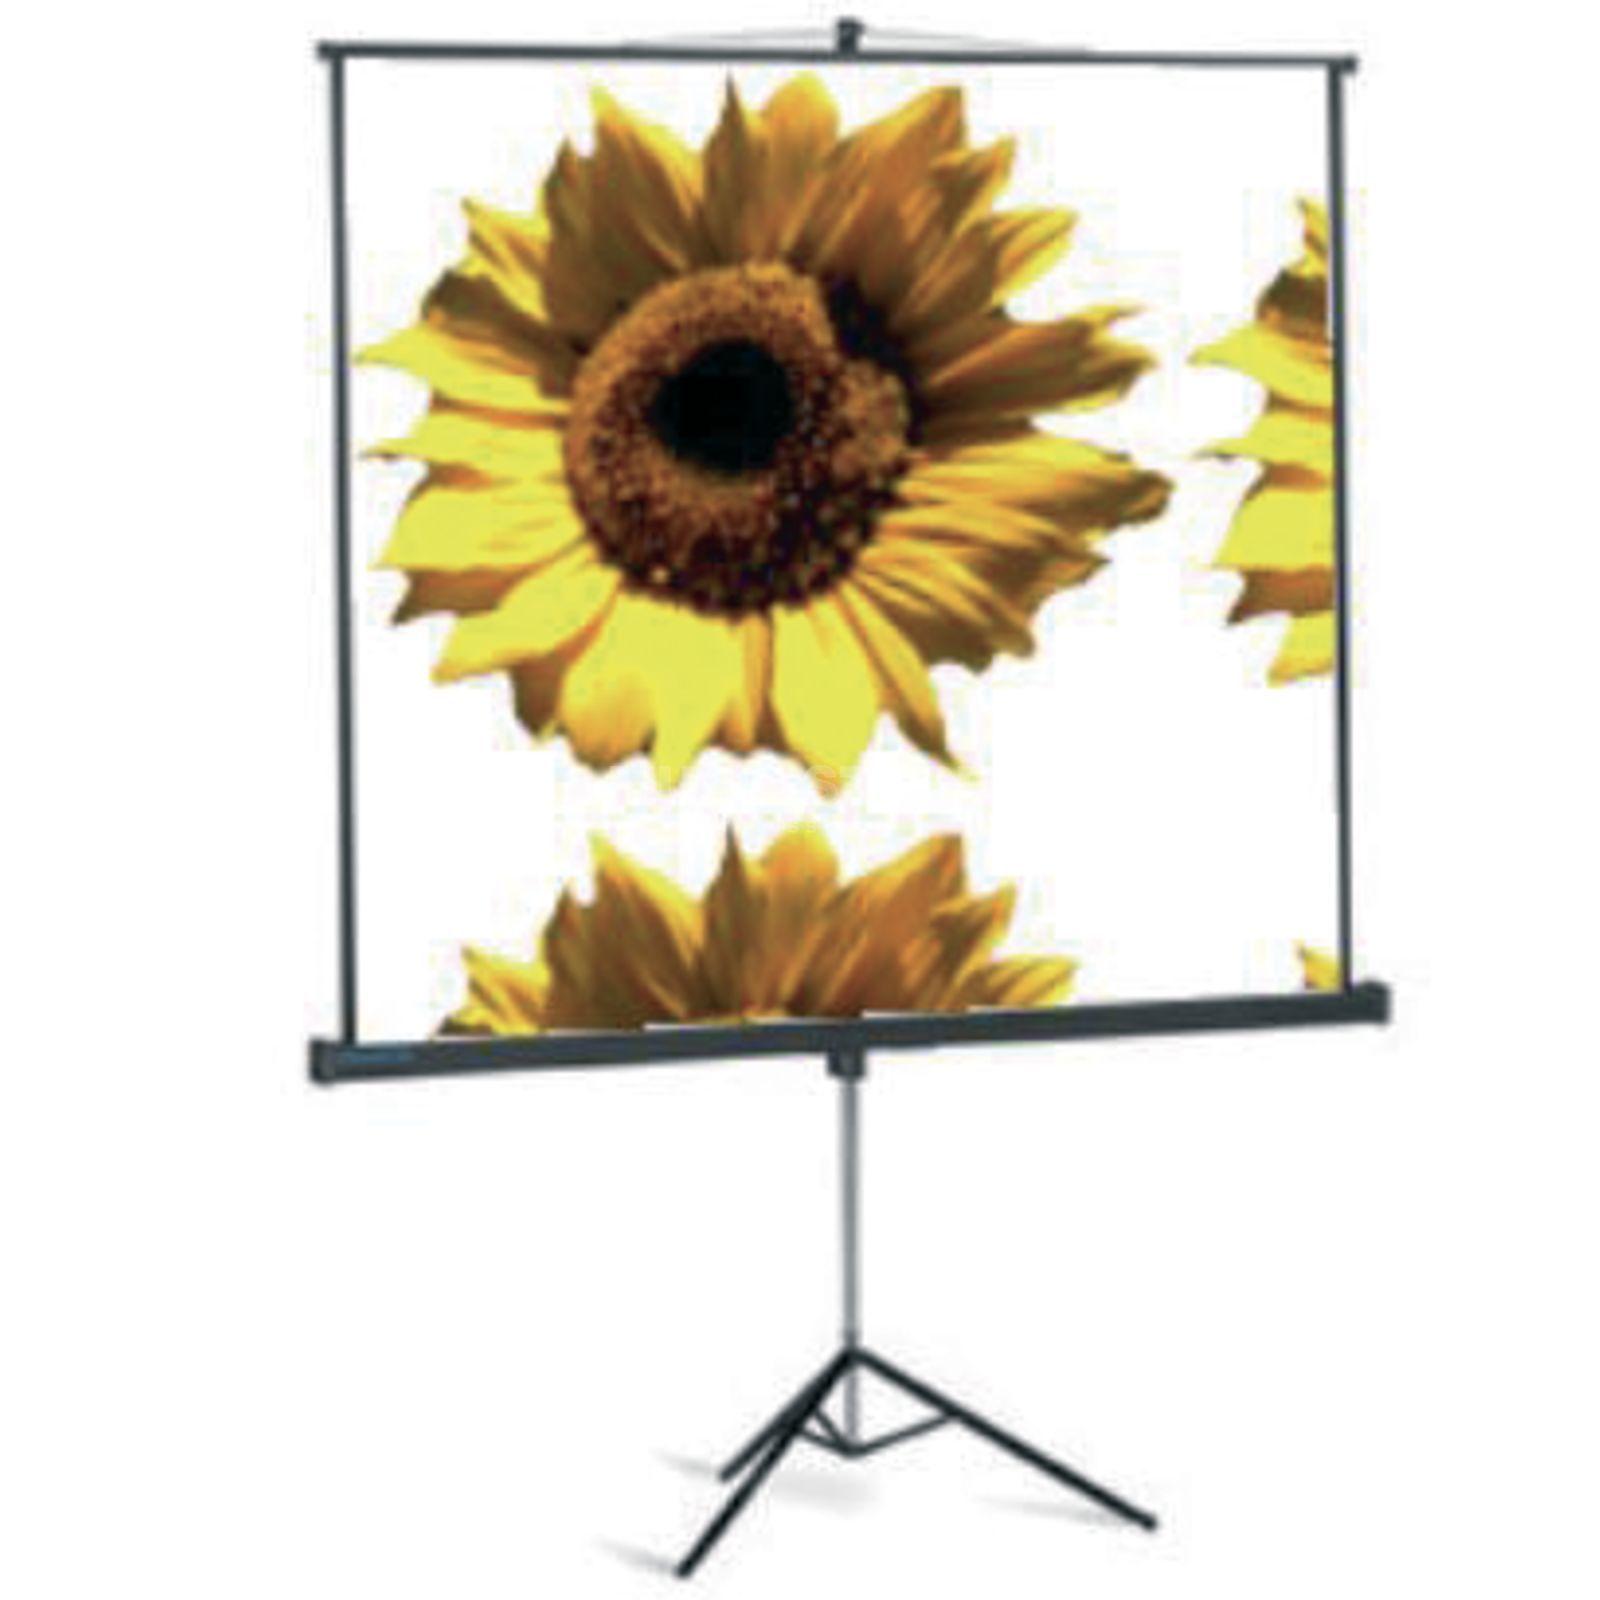 lightmaxx stativ leinwand 200 x 150 cm 100 4 3. Black Bedroom Furniture Sets. Home Design Ideas